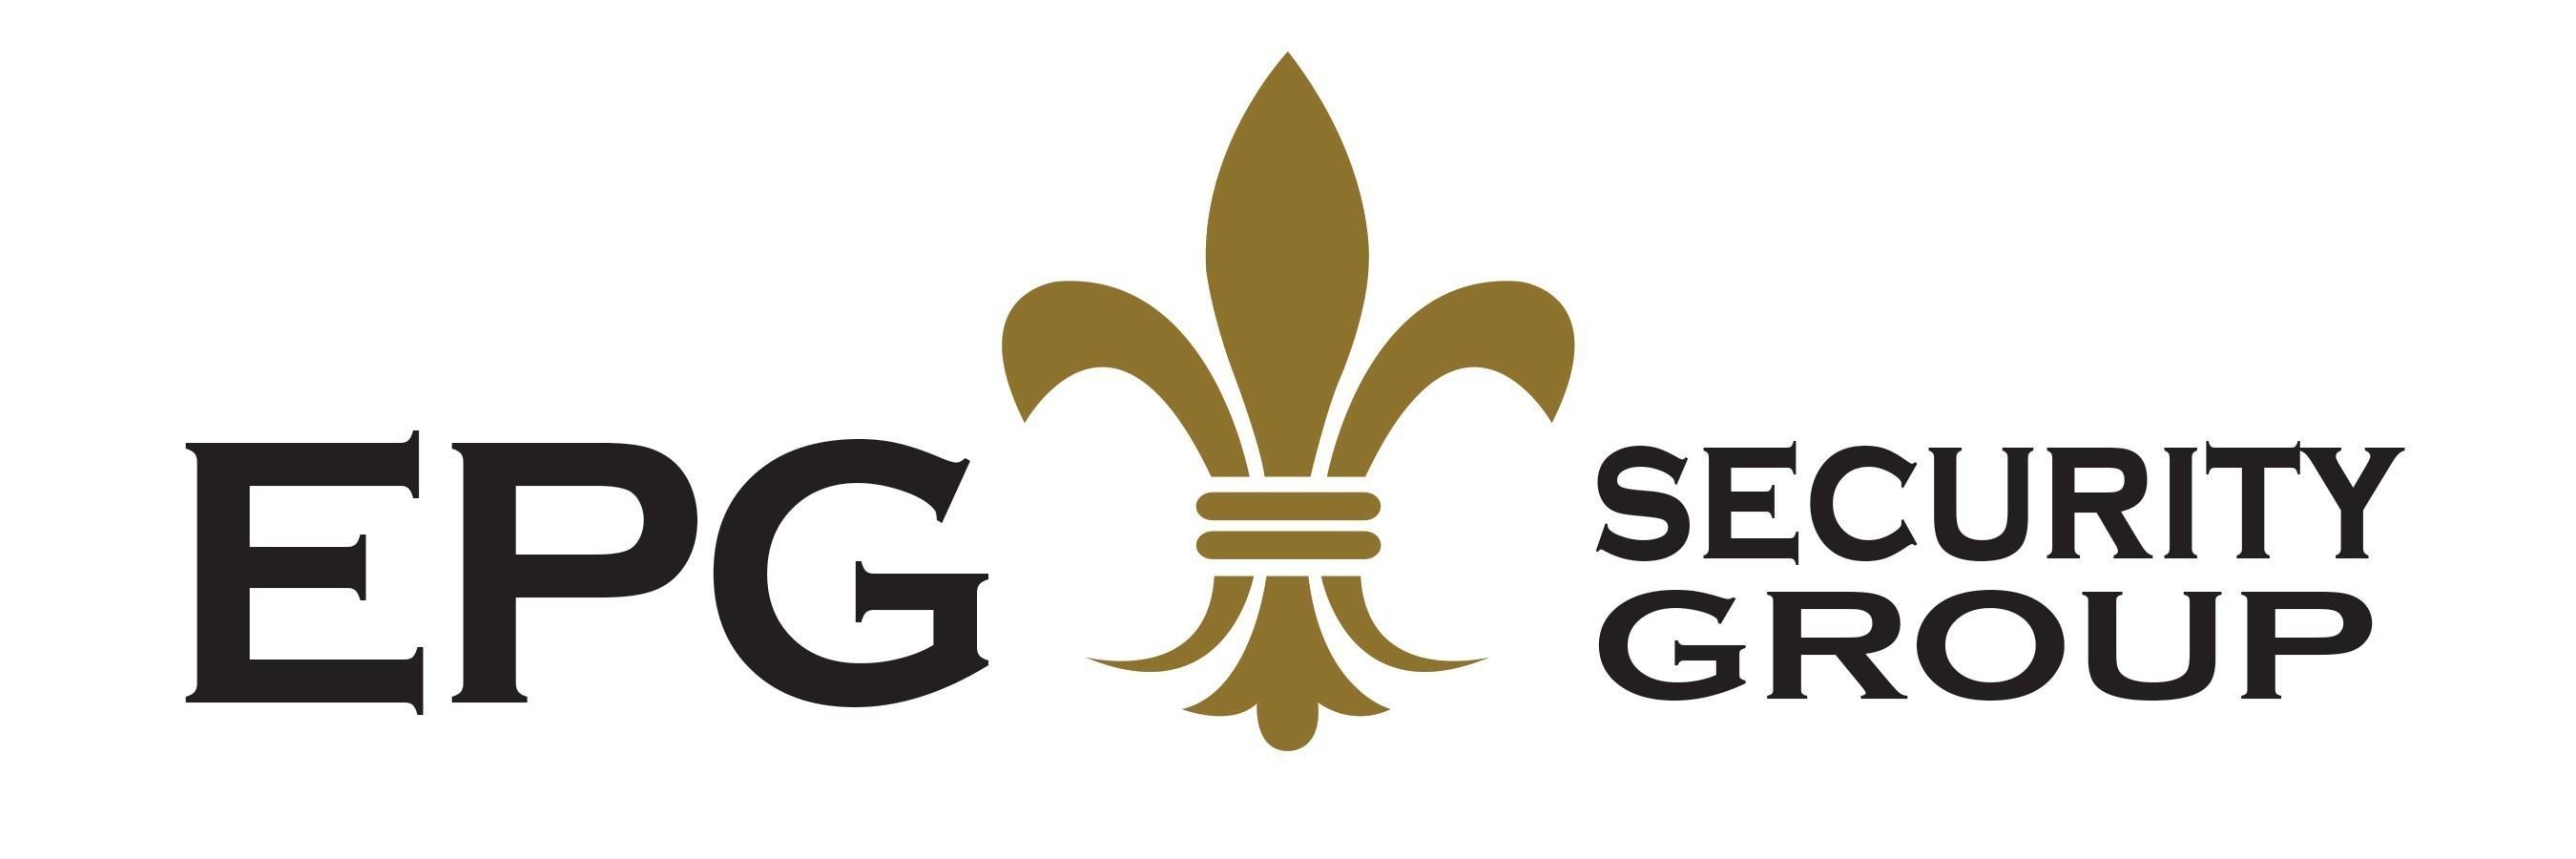 EPG Security Group logo